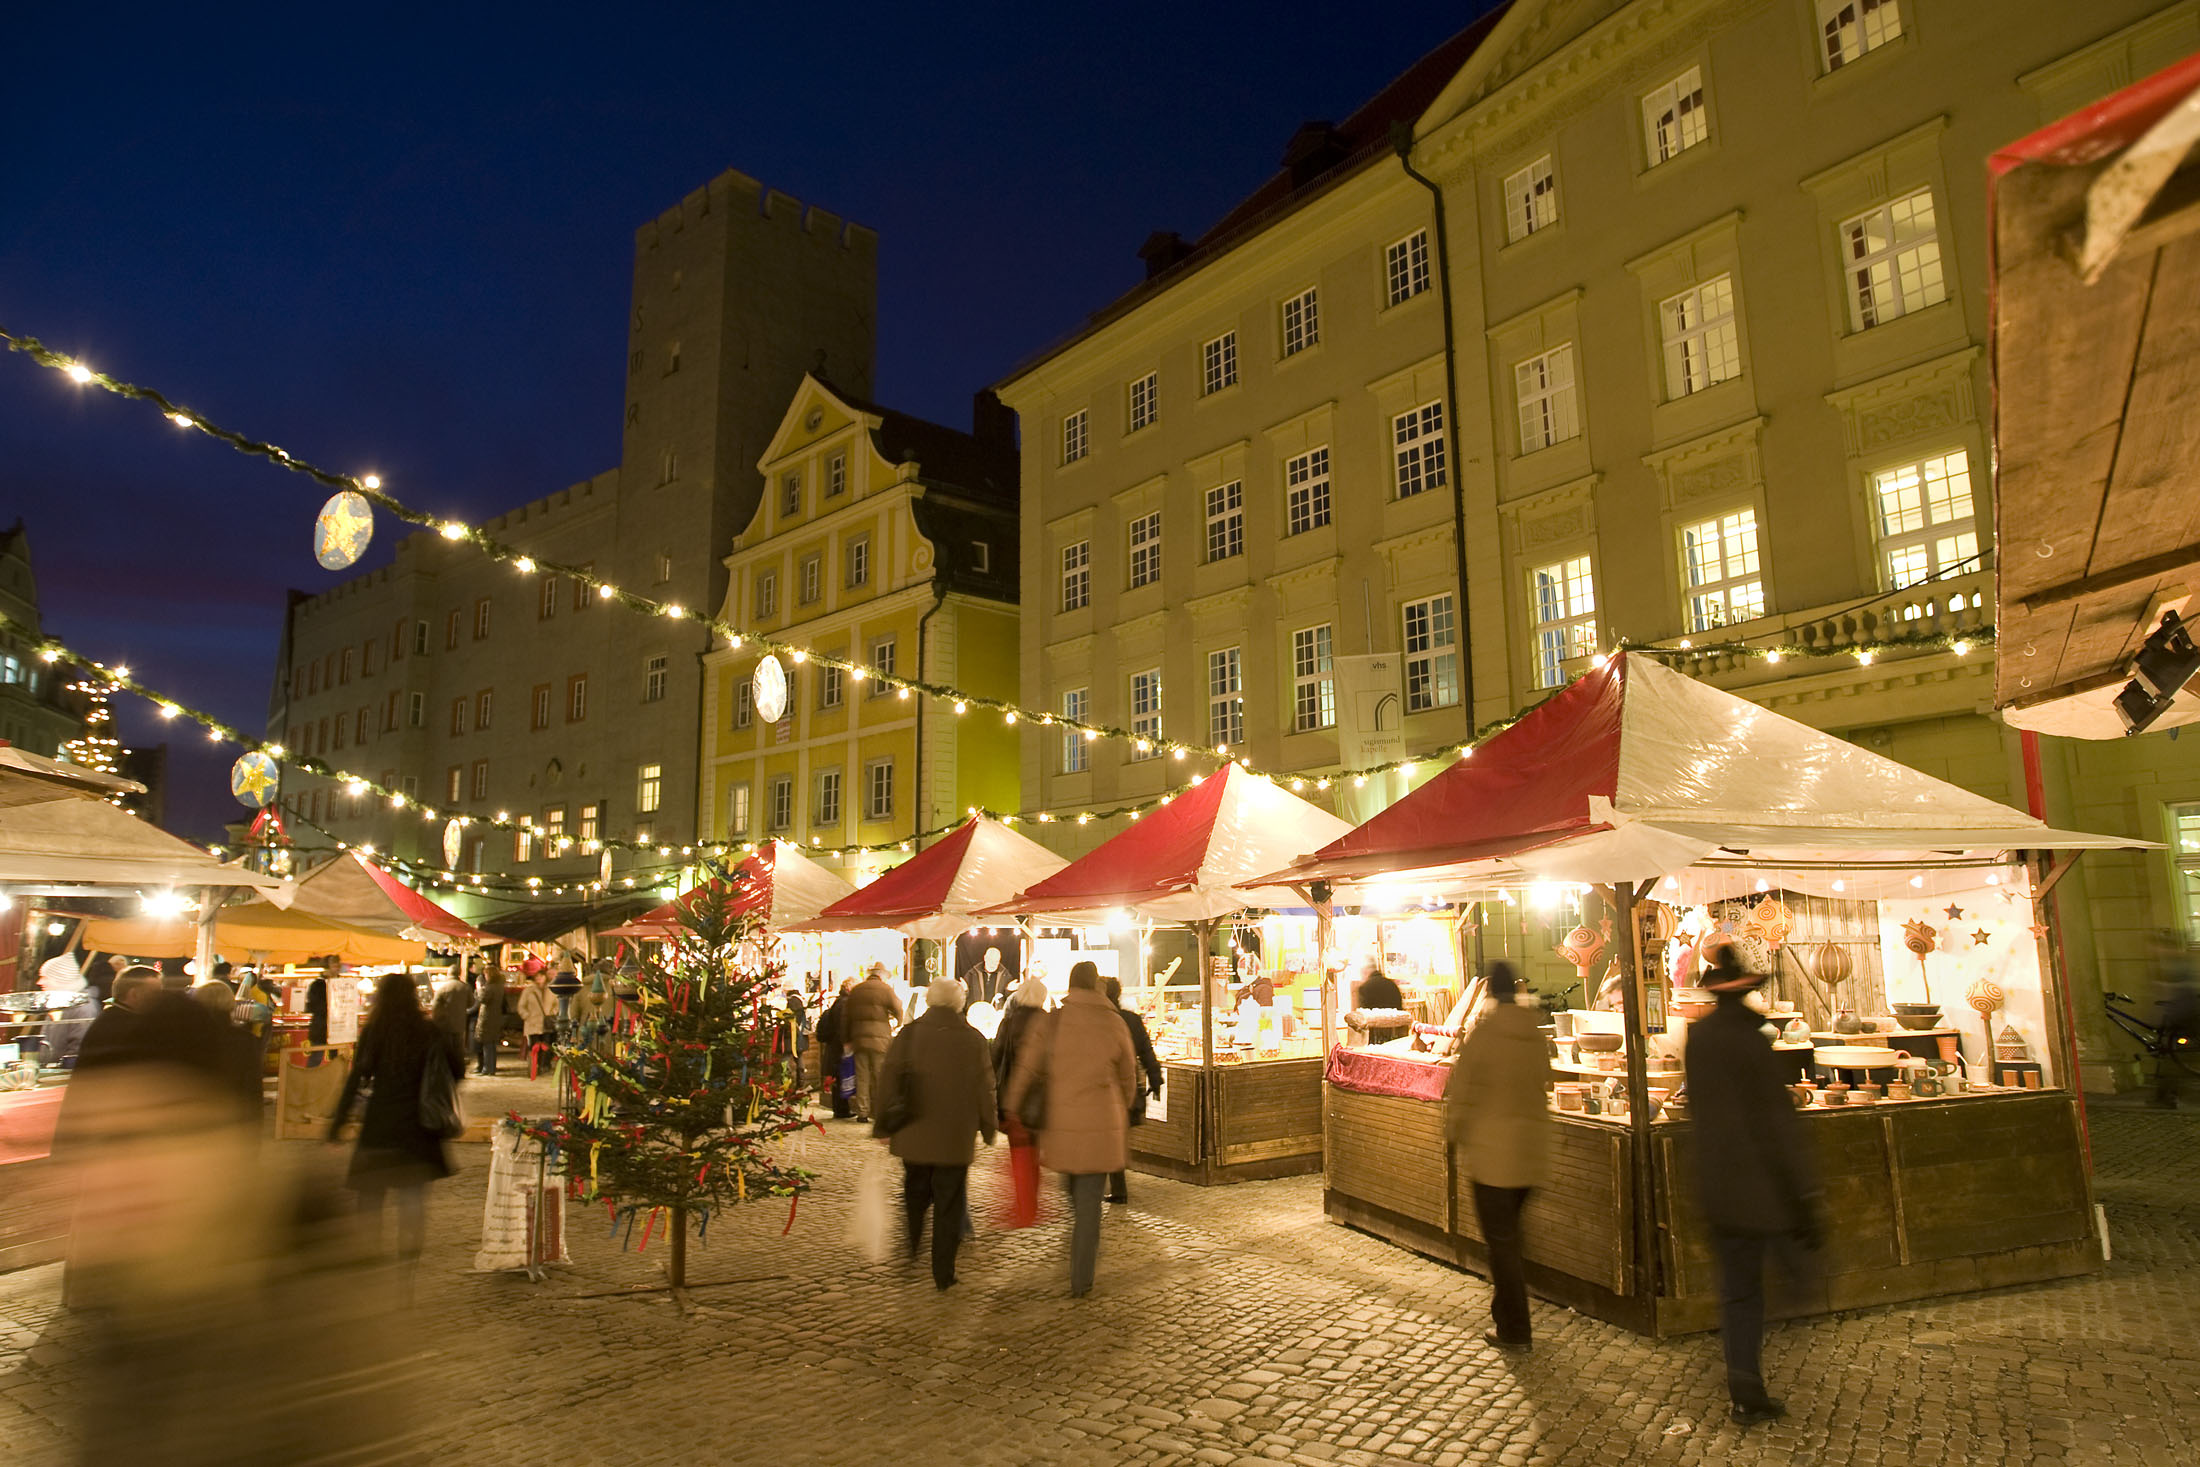 Christmas Market Regensburg - Christkindlmarkt Regensburg